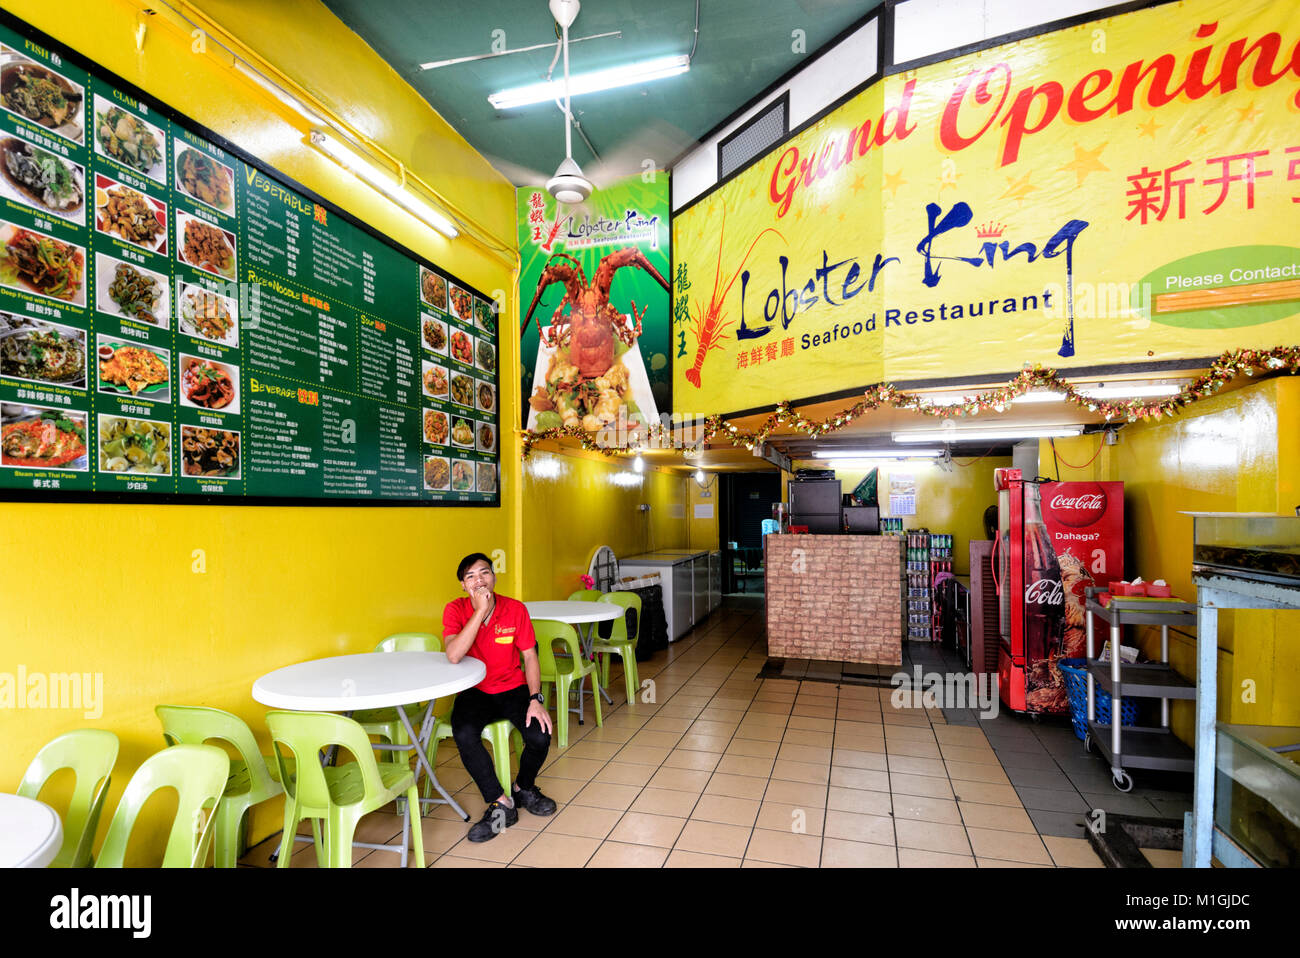 Interior of a seafood restaurant in town centre, Kota Kinabalu, Sabah, Borneo, Malaysia - Stock Image